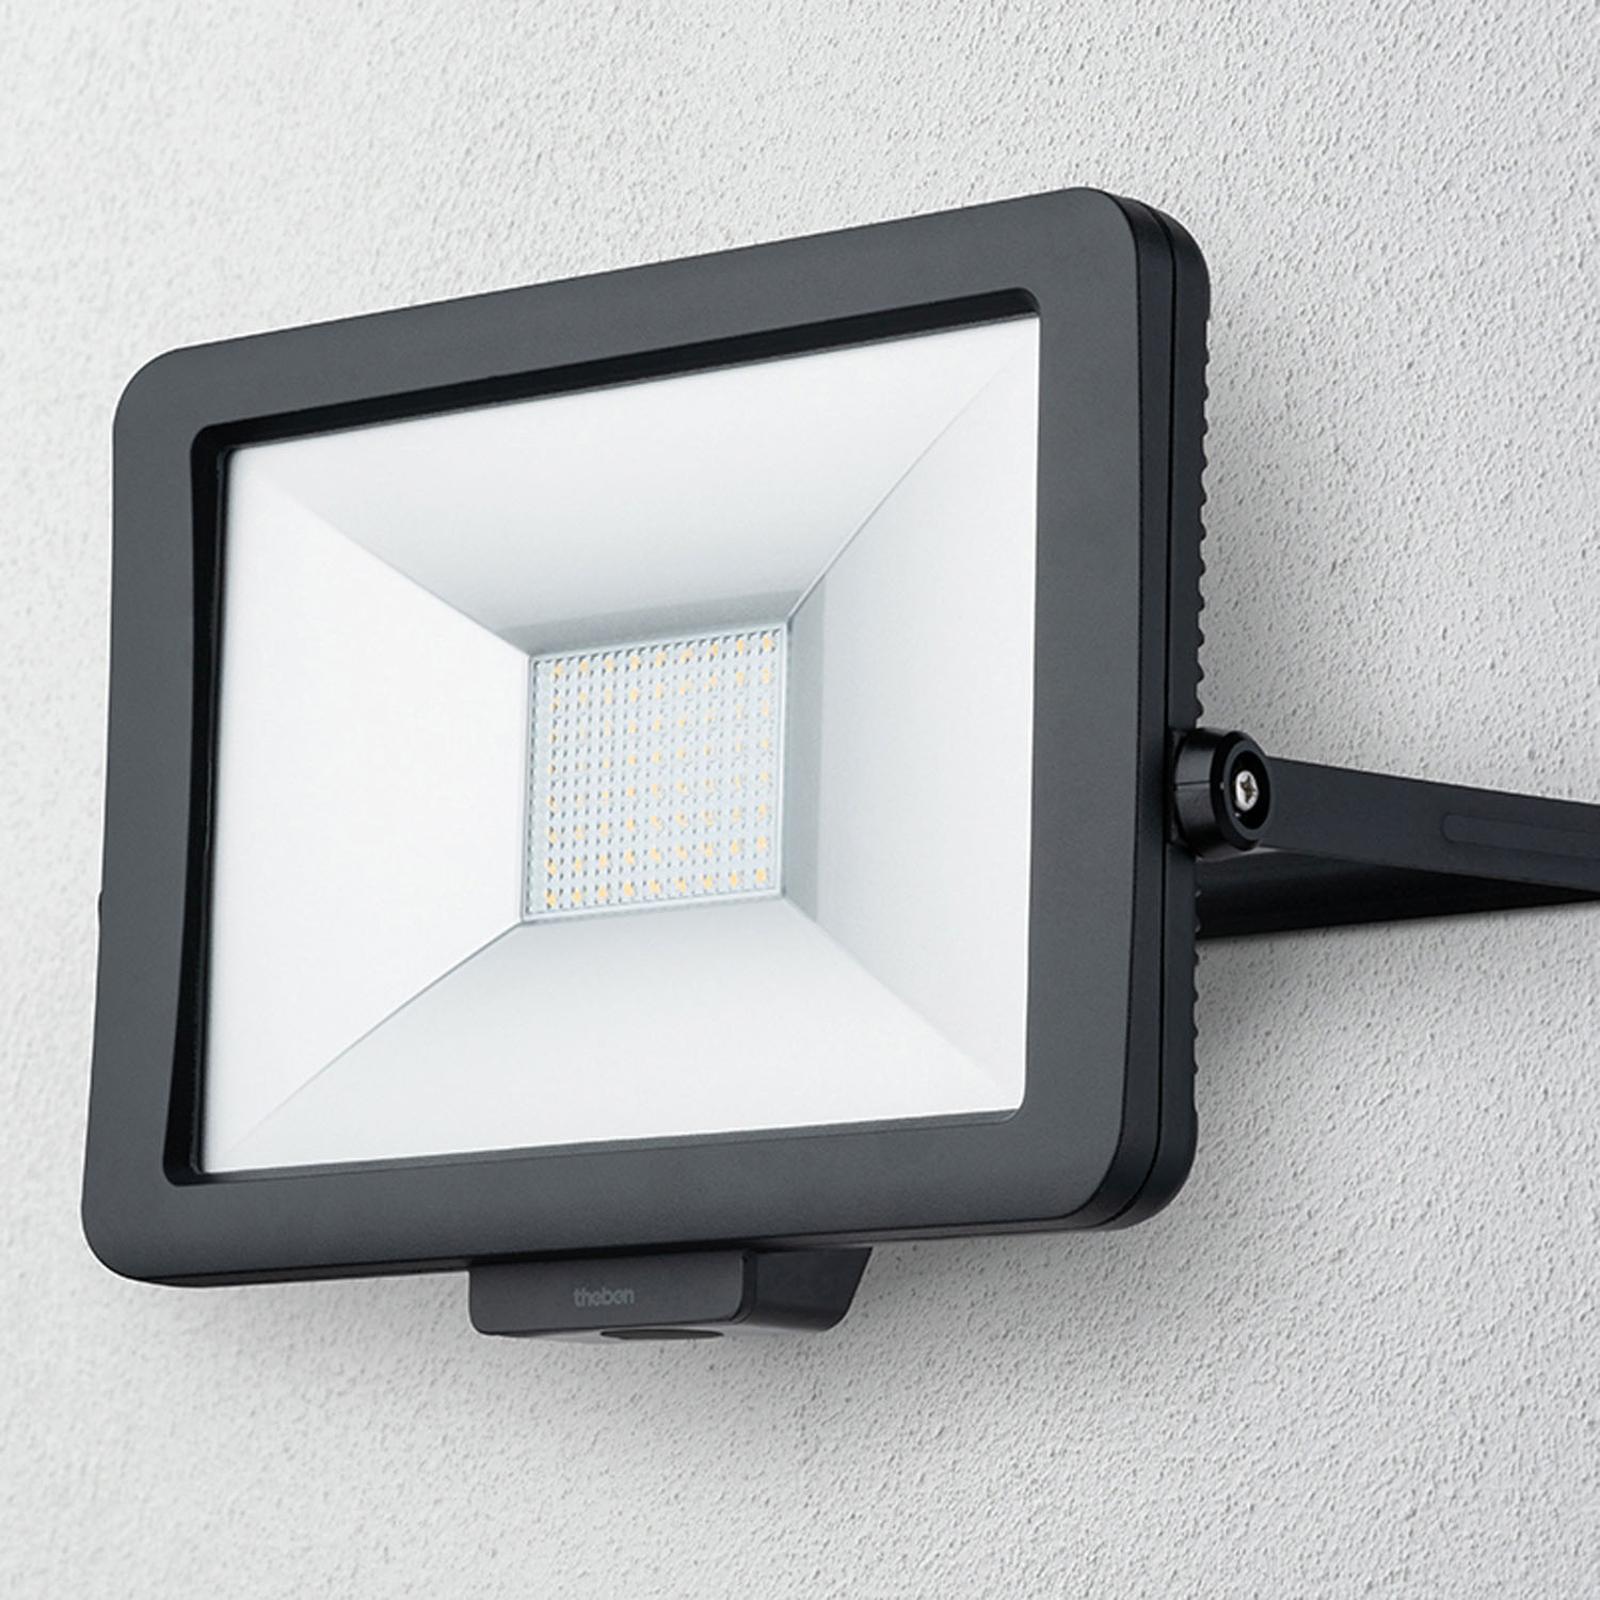 Theben theLeda B50L LED-Außenstrahler, schwarz